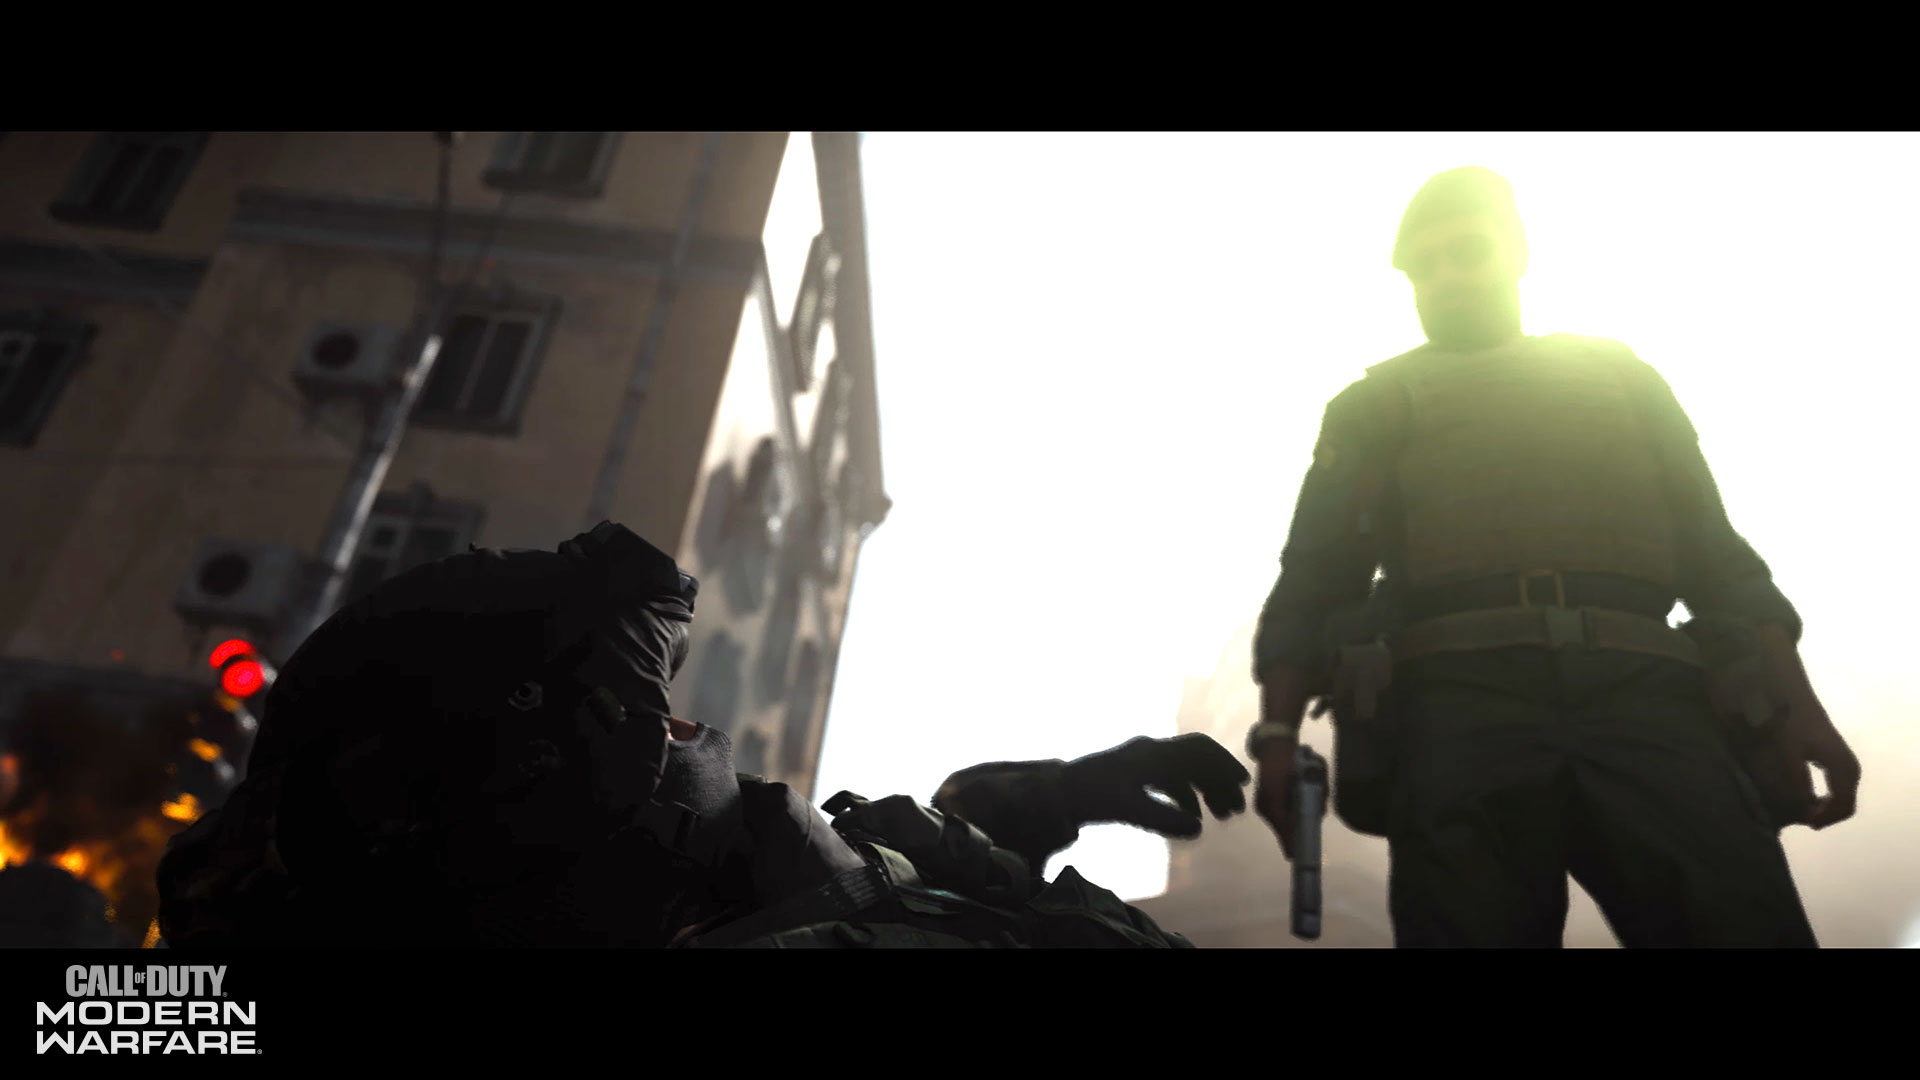 Call of Duty®: Modern Warfare®: Biographies: Khaled Al-Asad - Image 1